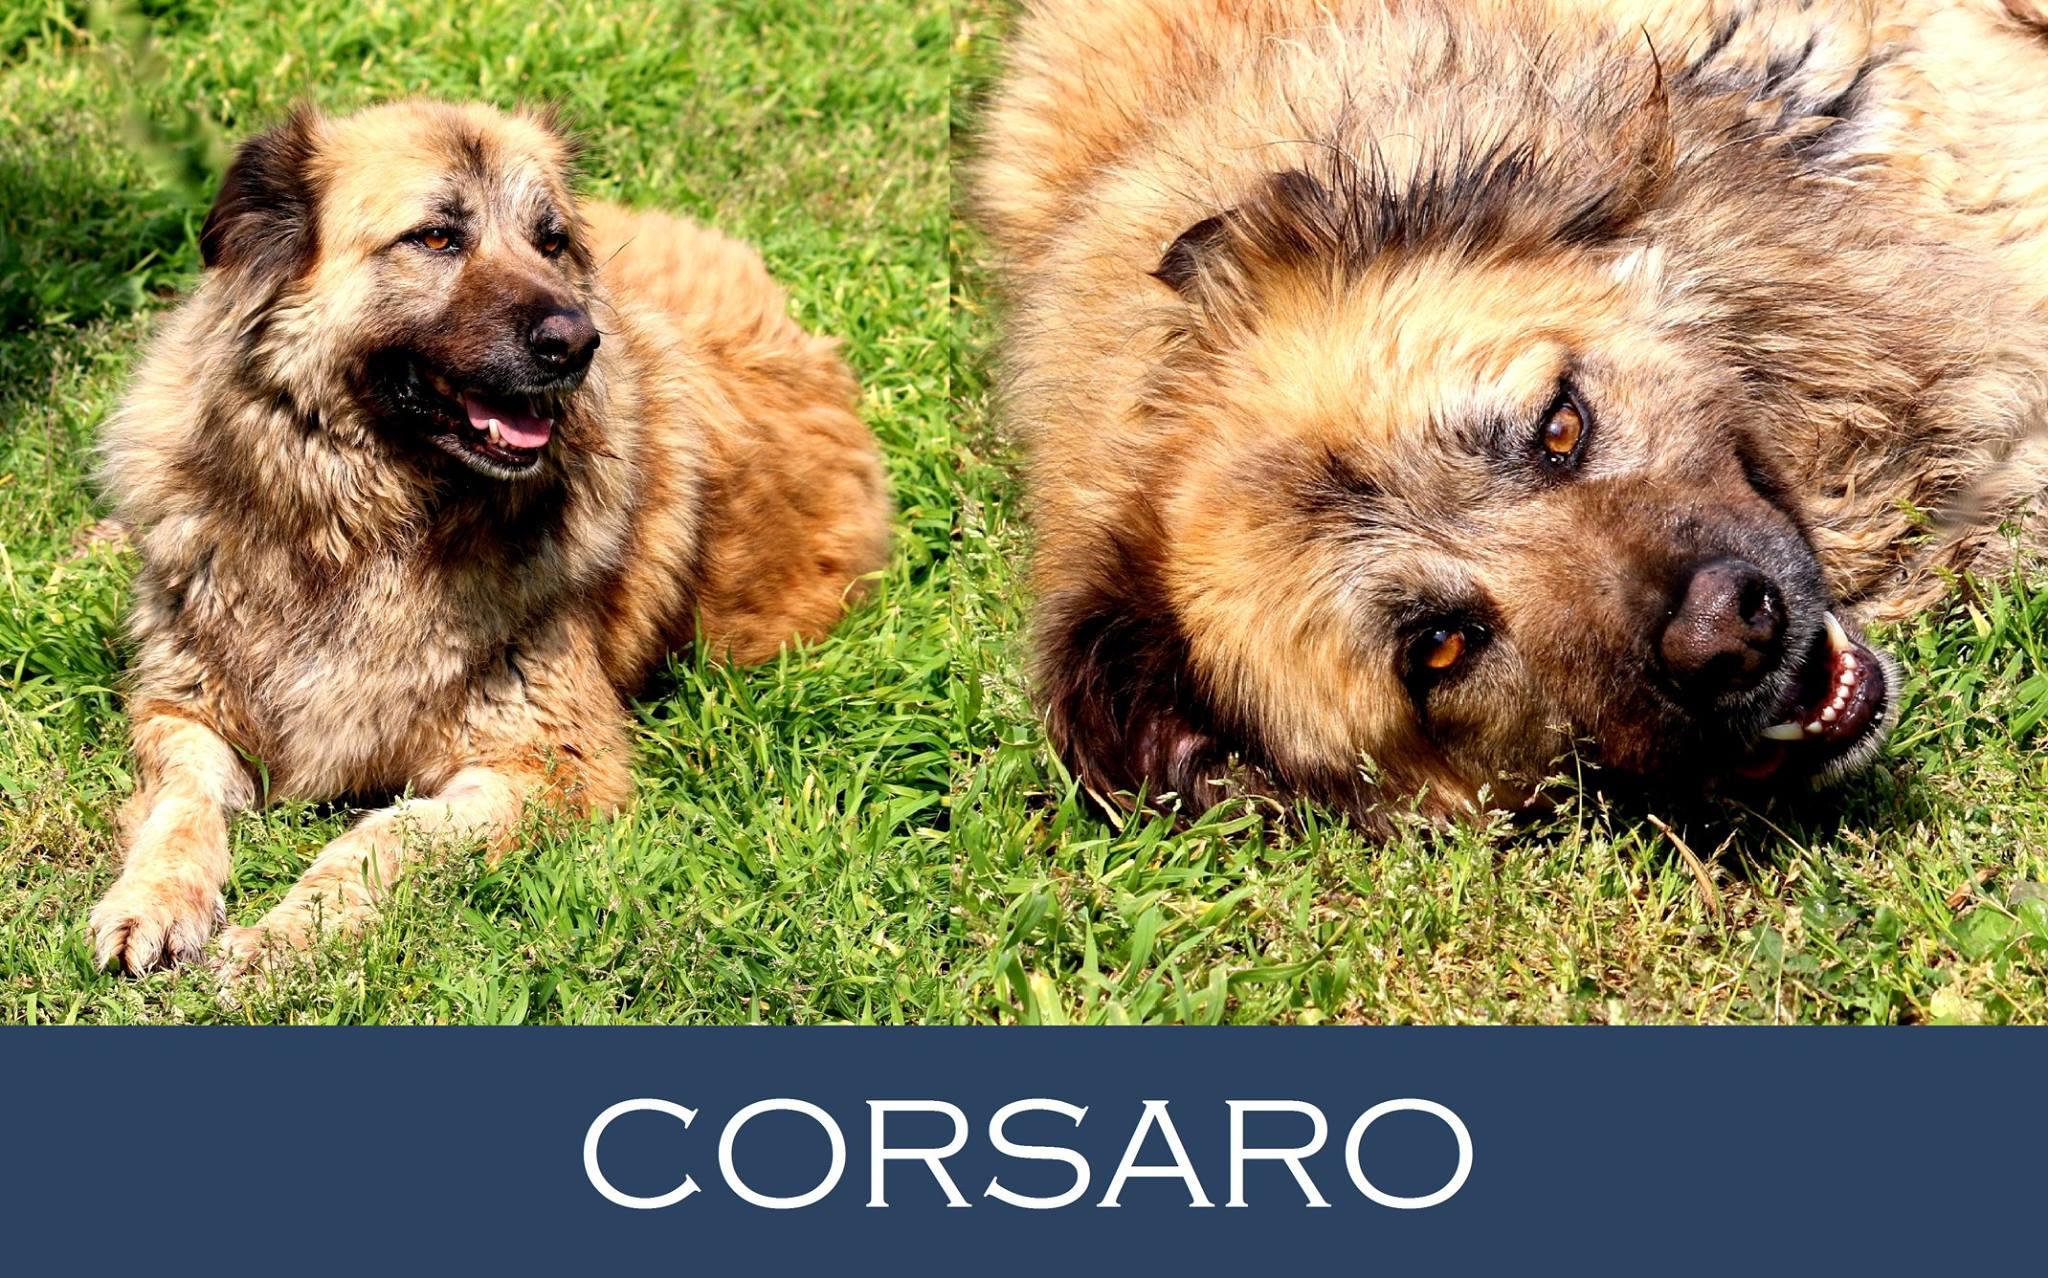 Corsaro-Tip. Leonberger